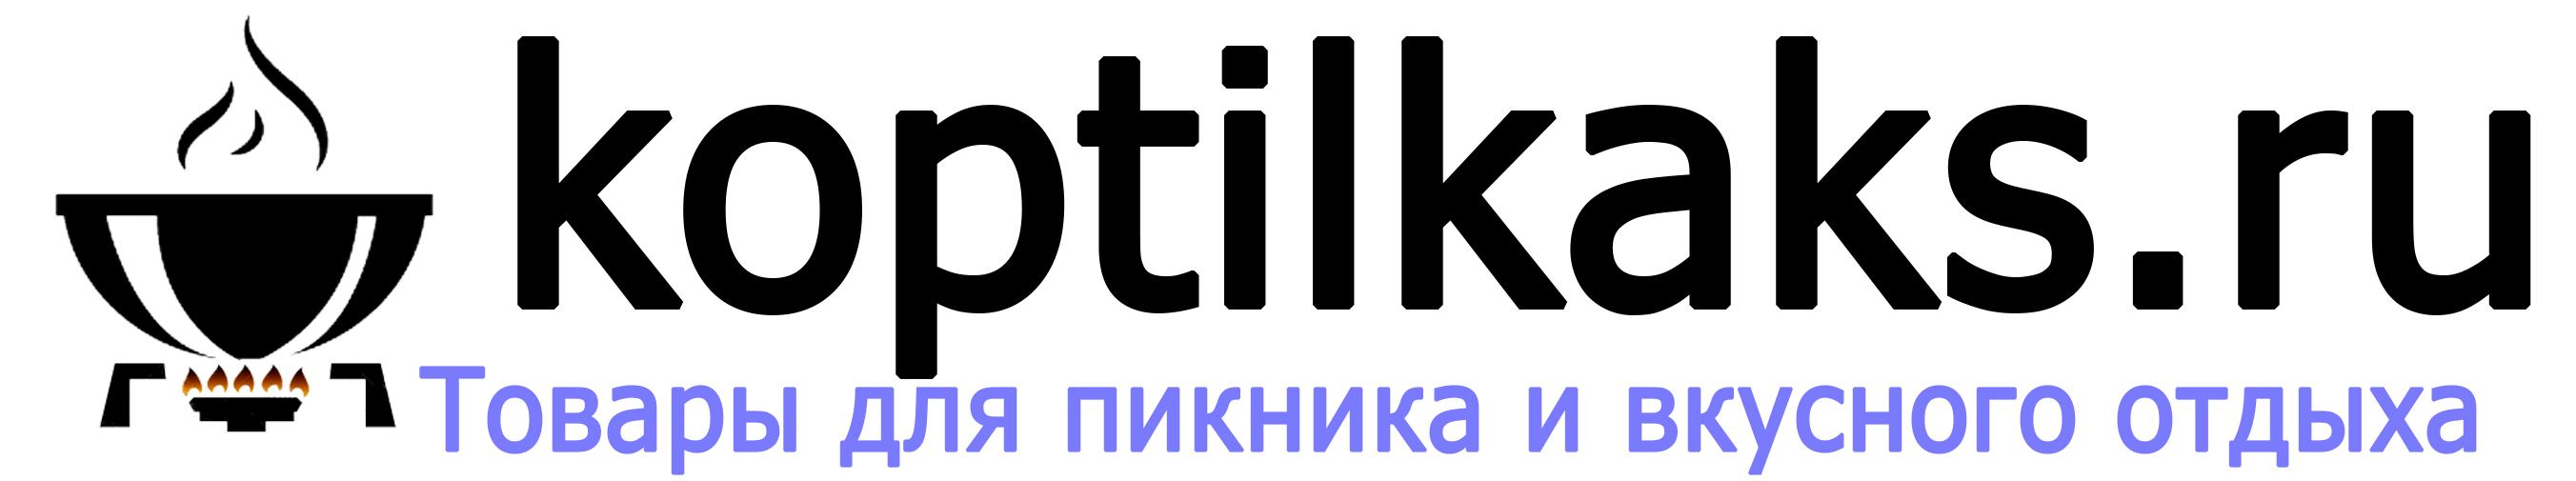 Интернет магазин Ивана Чугунного